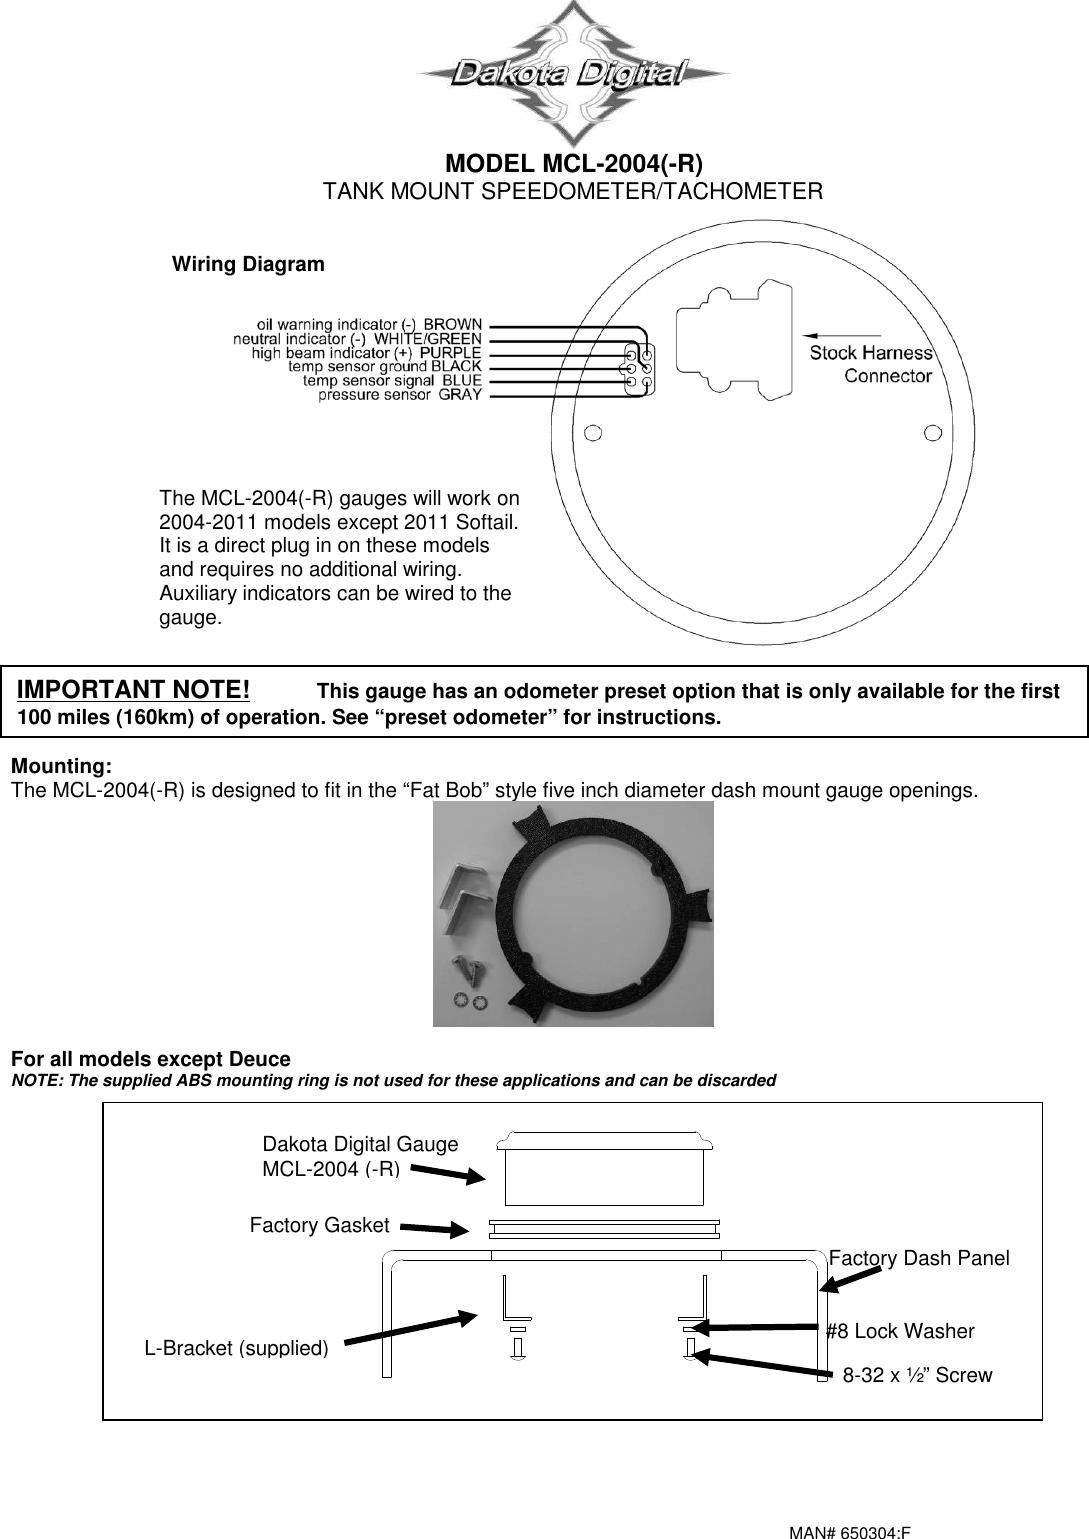 dakota digital motorcycle wiring diagram dakota digital mcl 2004 r users manual 650304f  dakota digital mcl 2004 r users manual